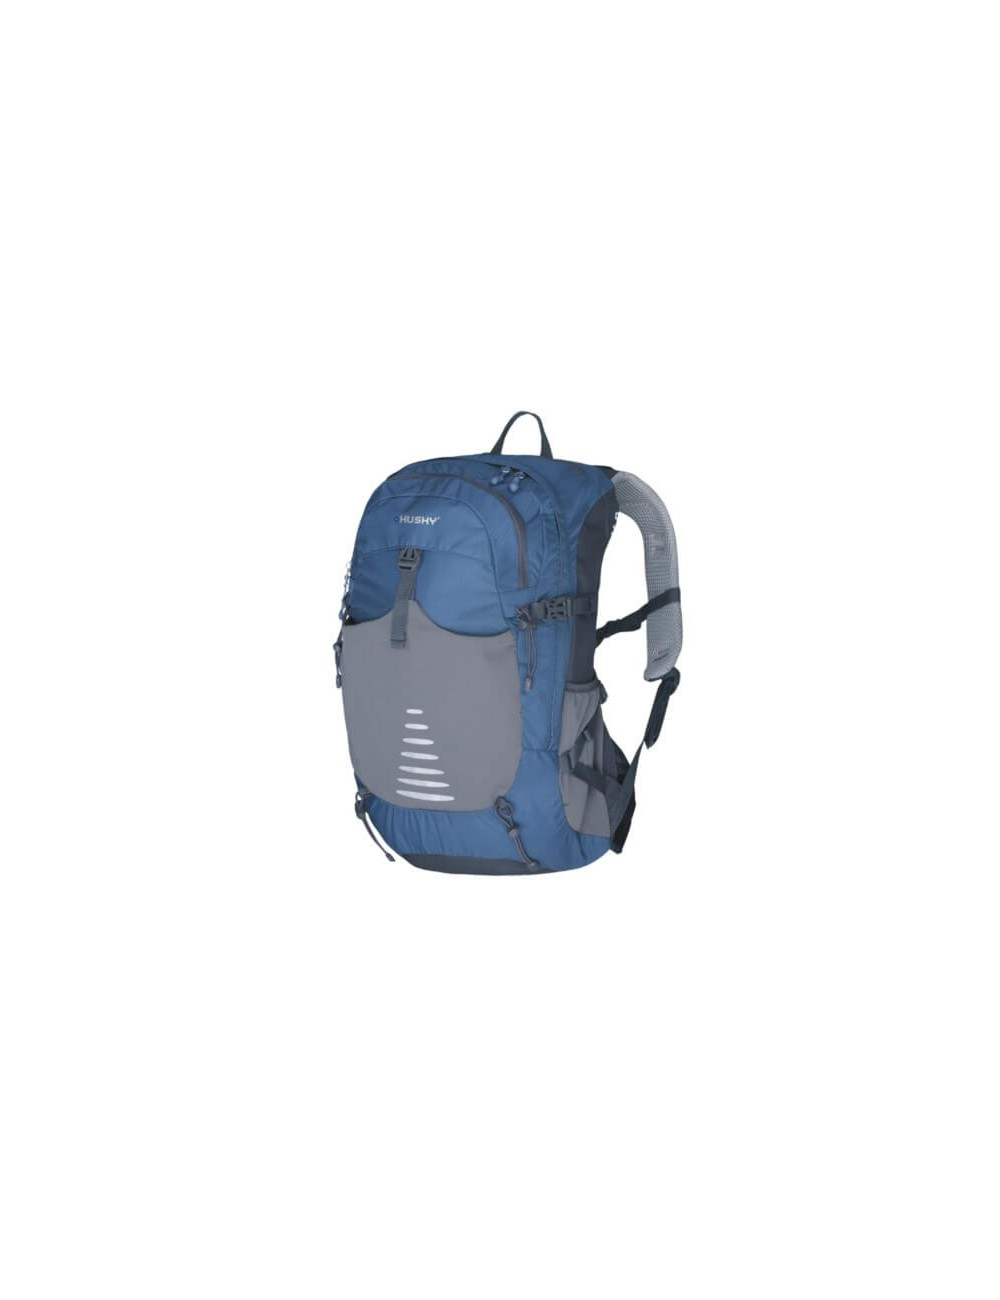 Husky rugzak Trekking - Cycling Backpack – Skid - 30 liter - Blauw